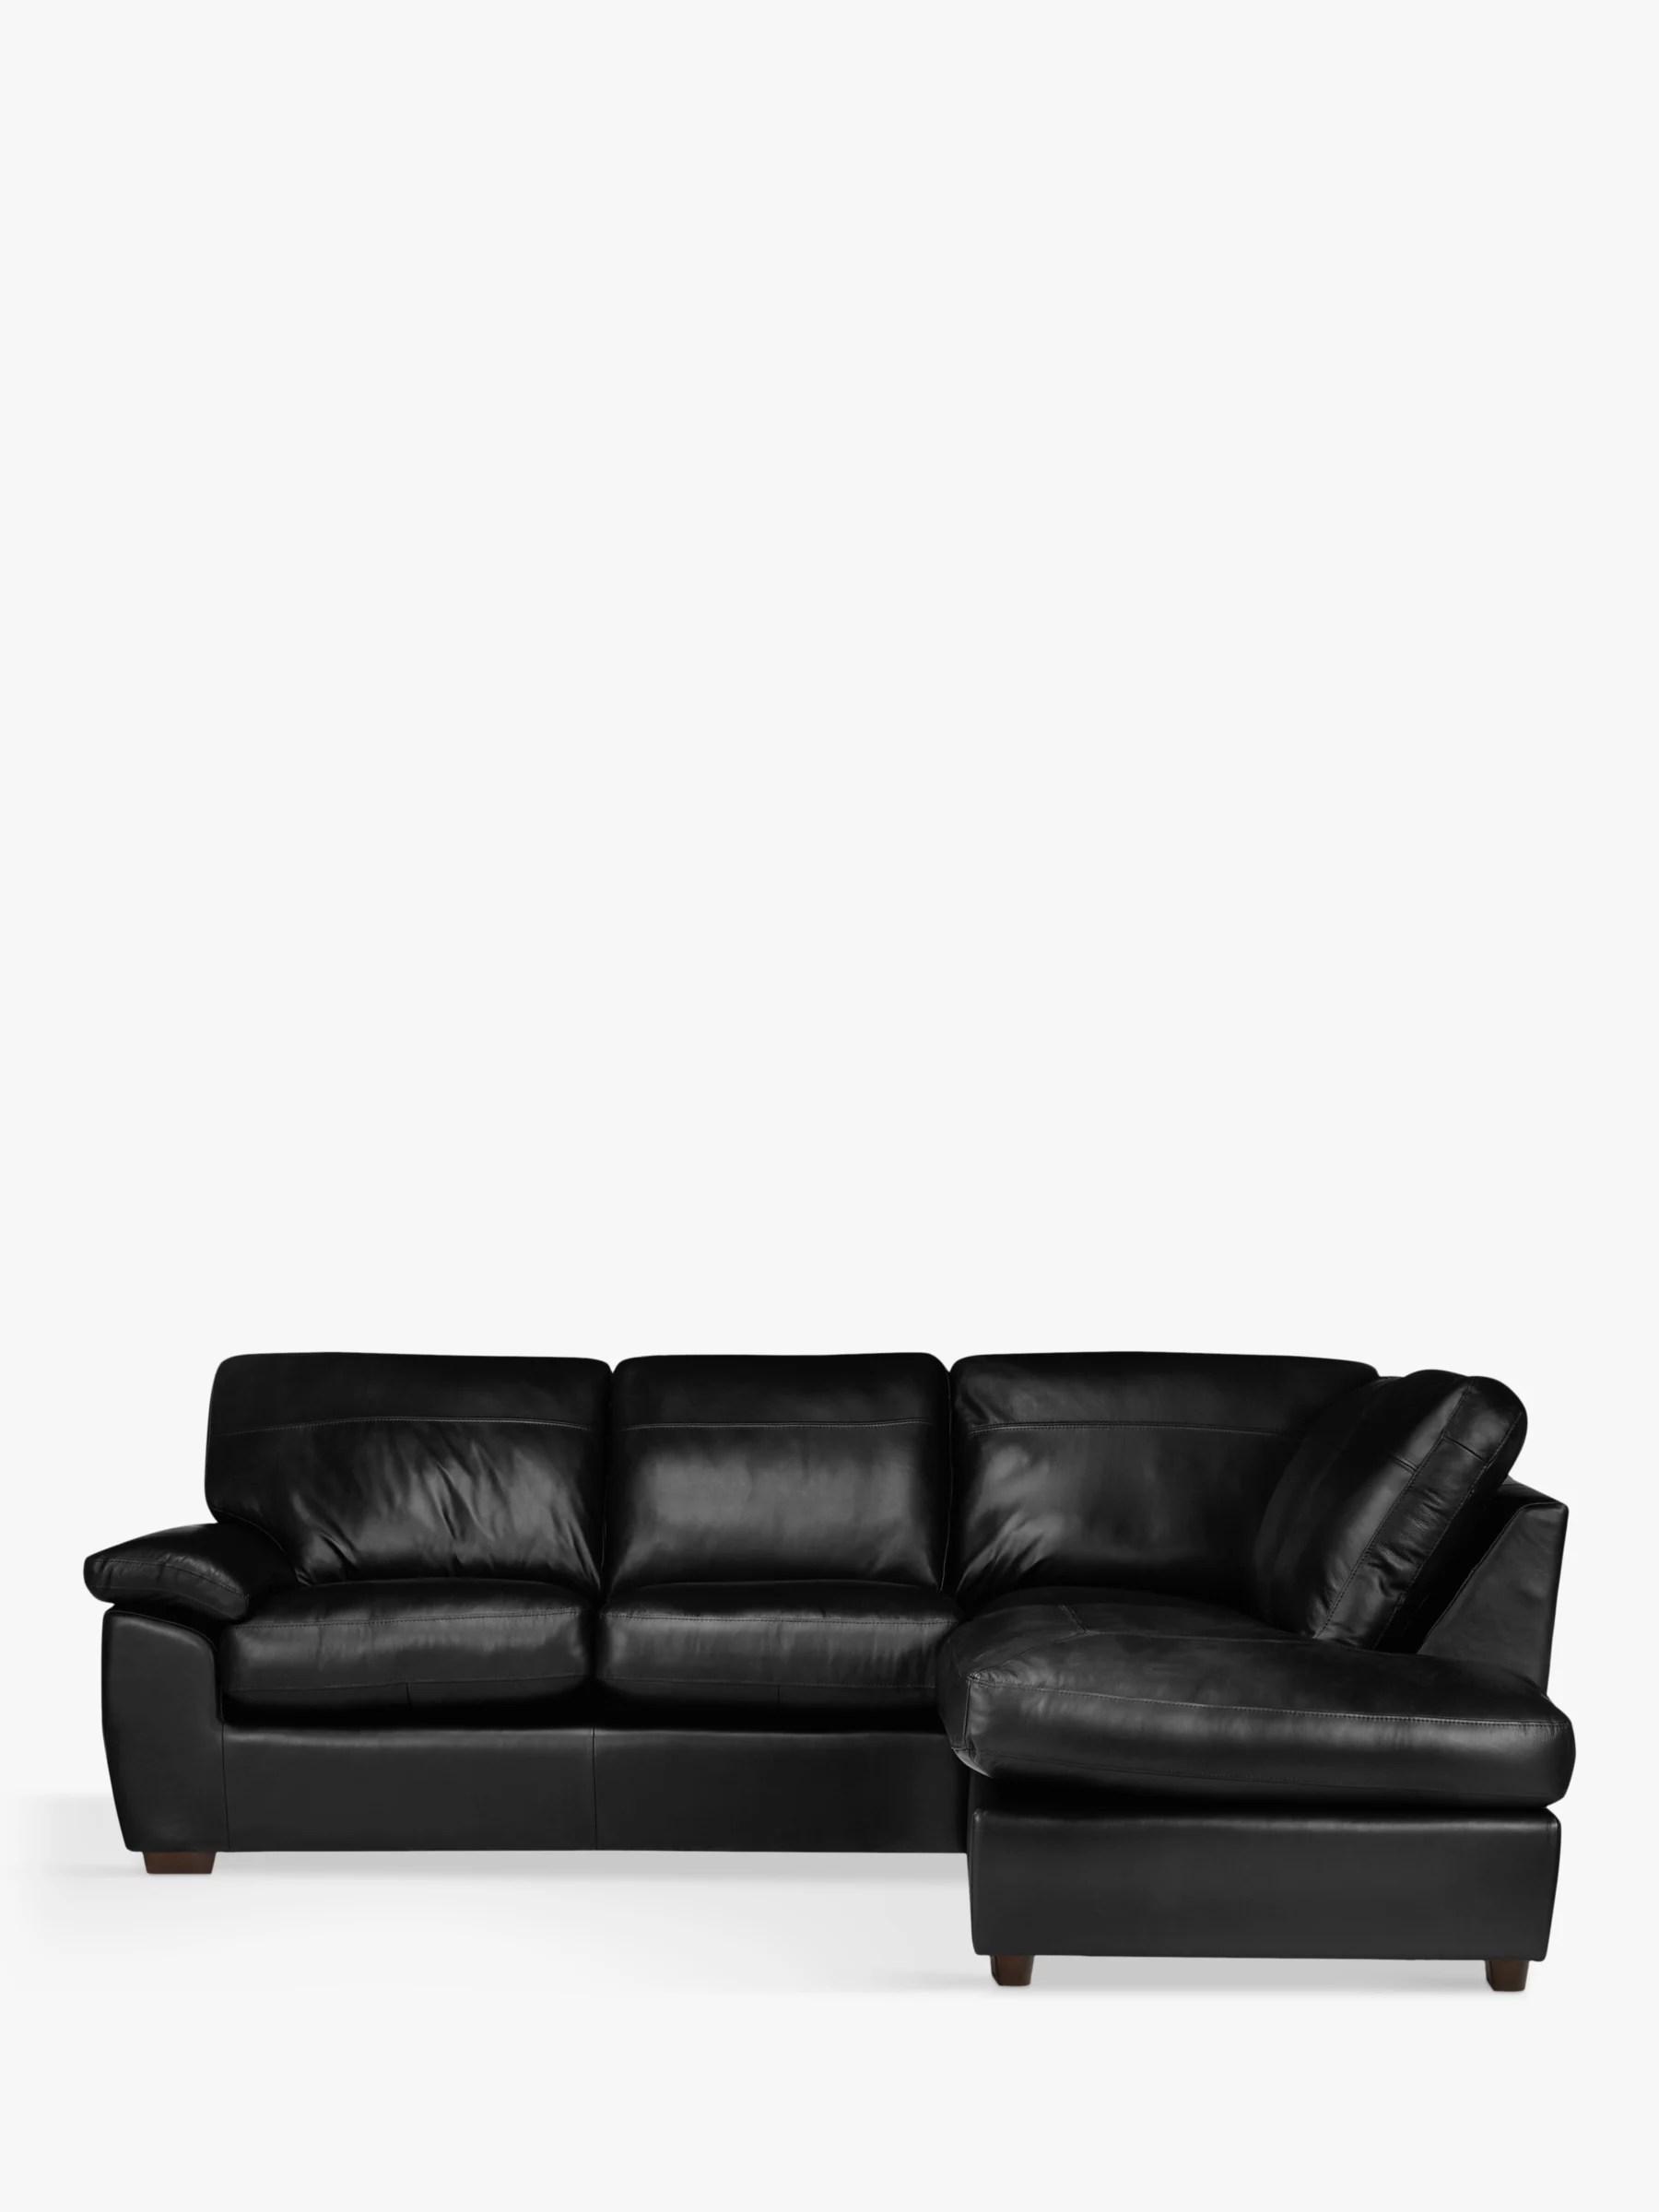 camden sofa john lewis leather sofas swansea enterprise park and partners rhf chaise corner end